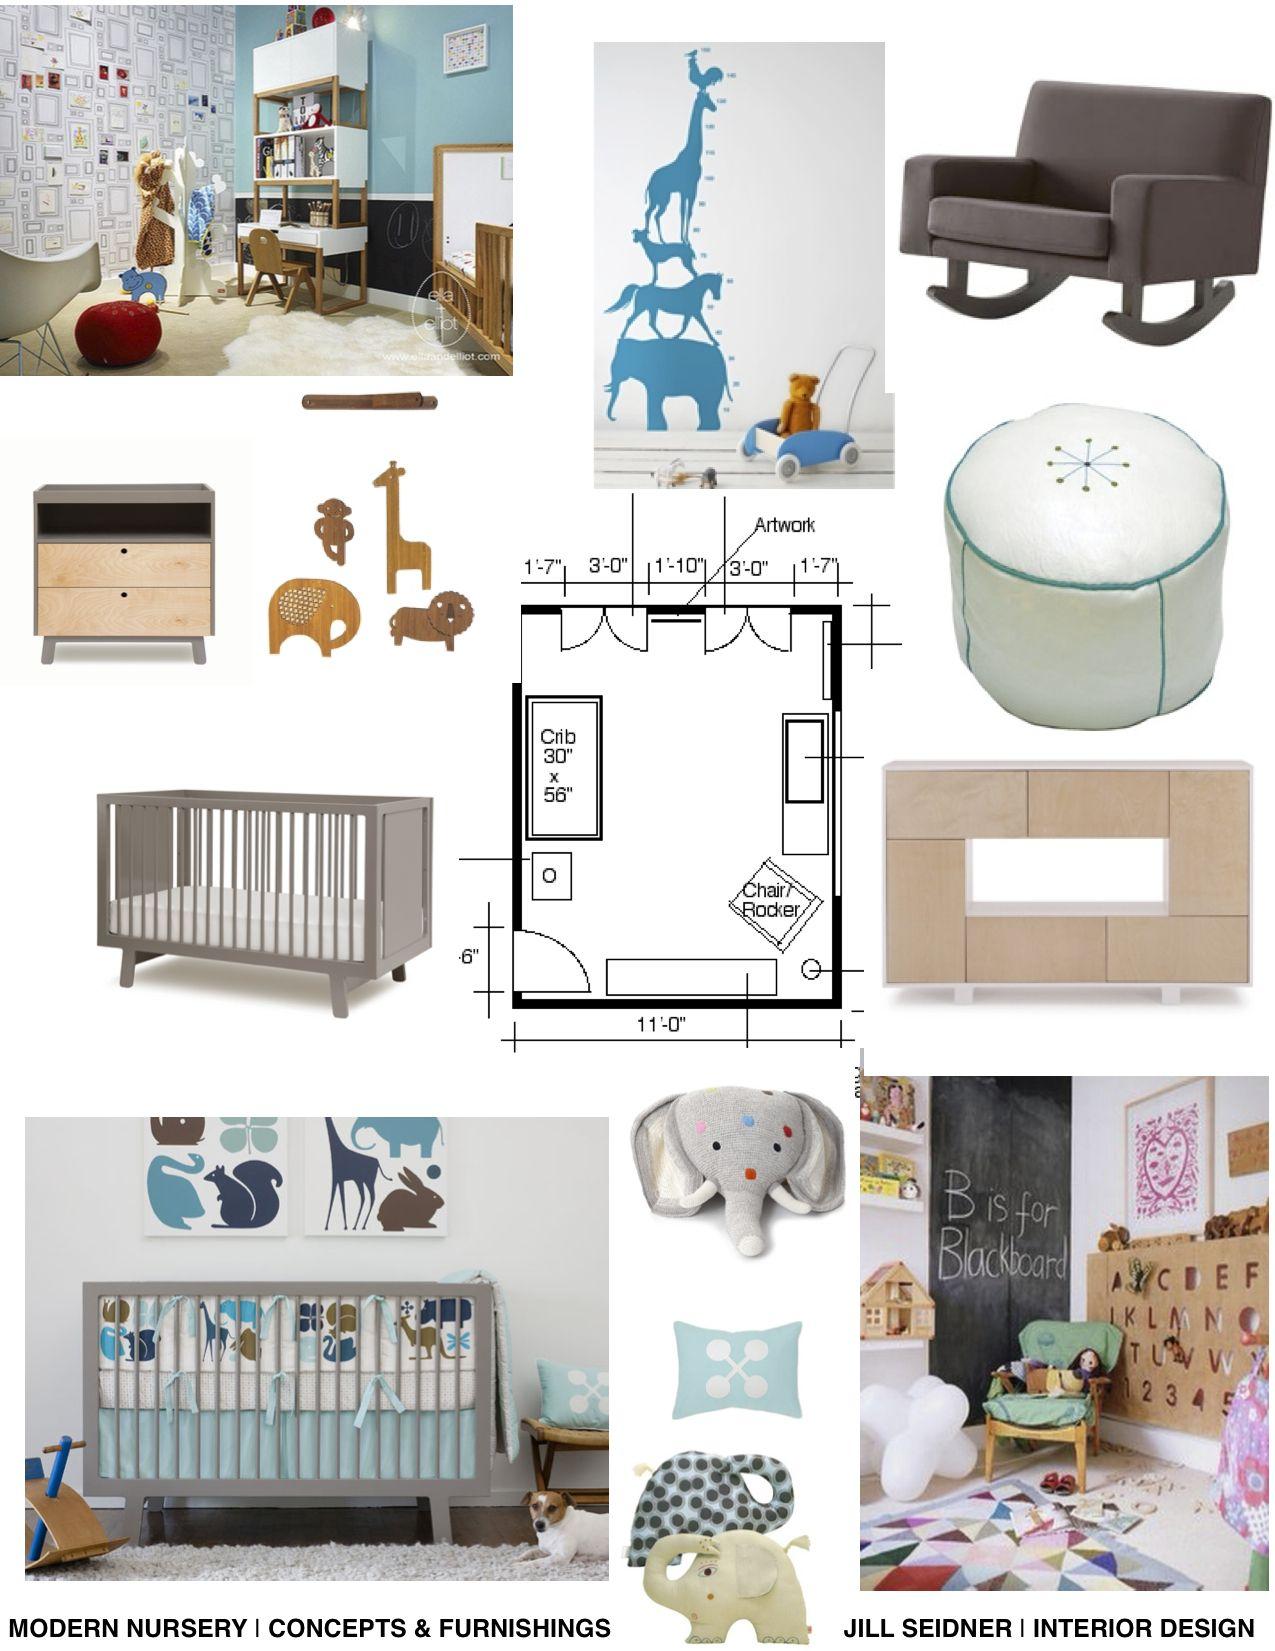 Concept board for nursery furniture